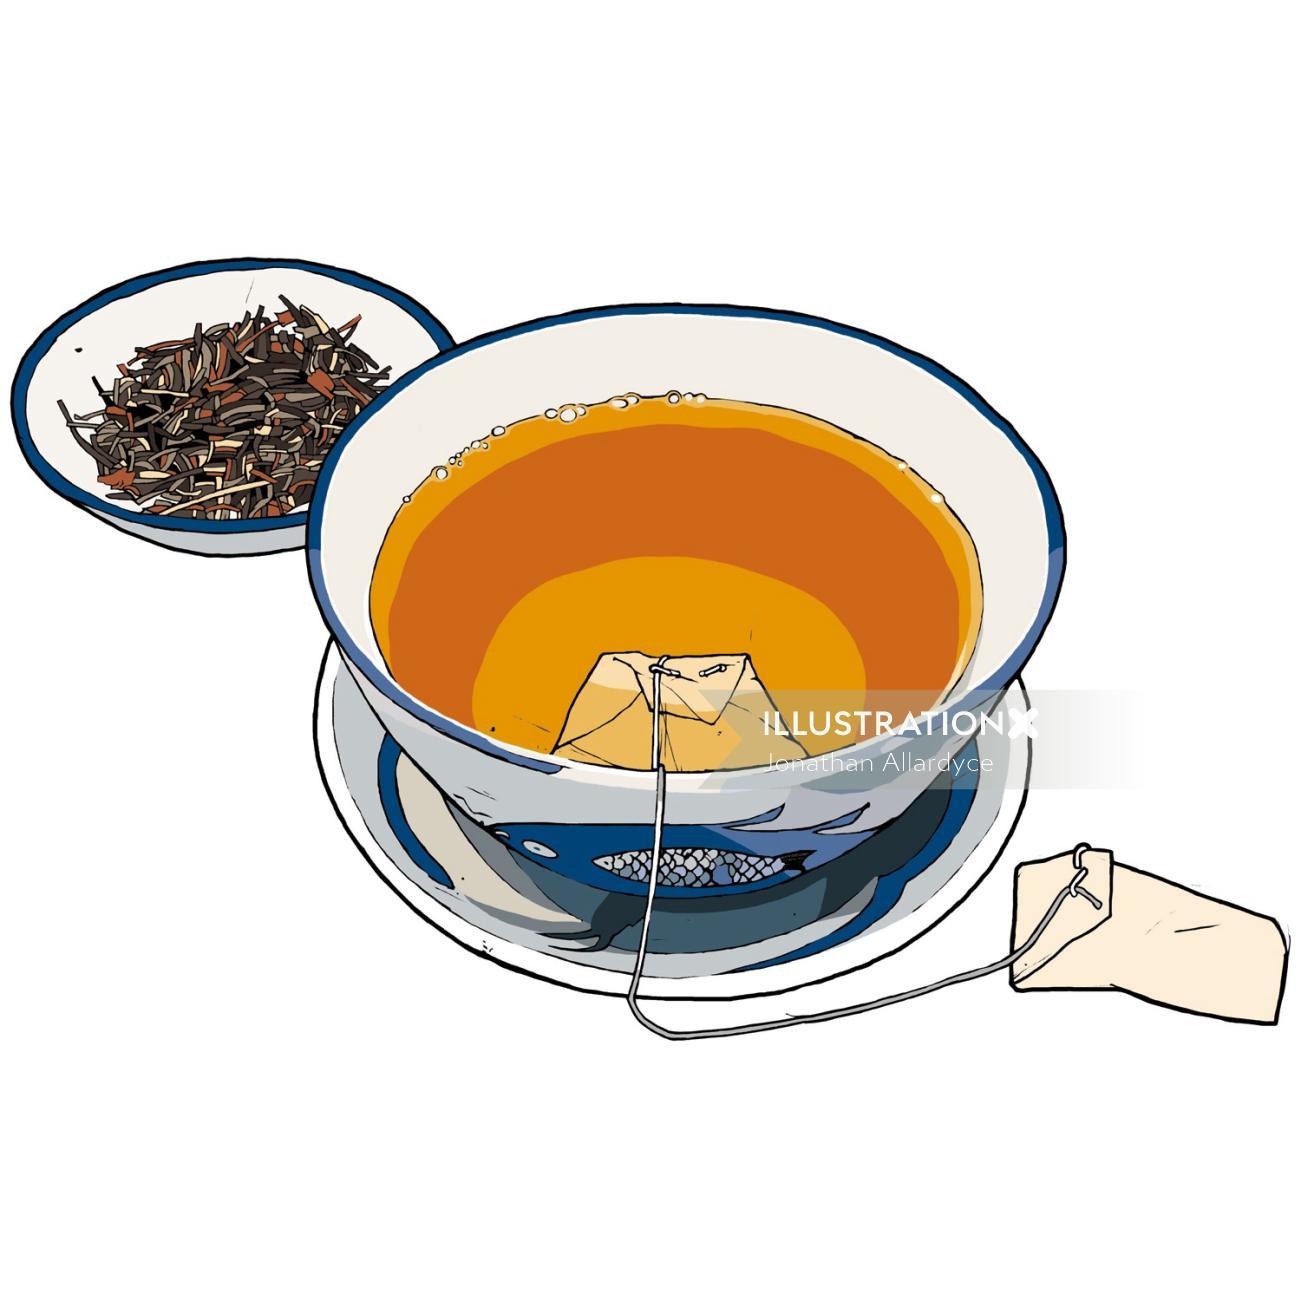 Tea cup illustration by Jonathan Allardyce